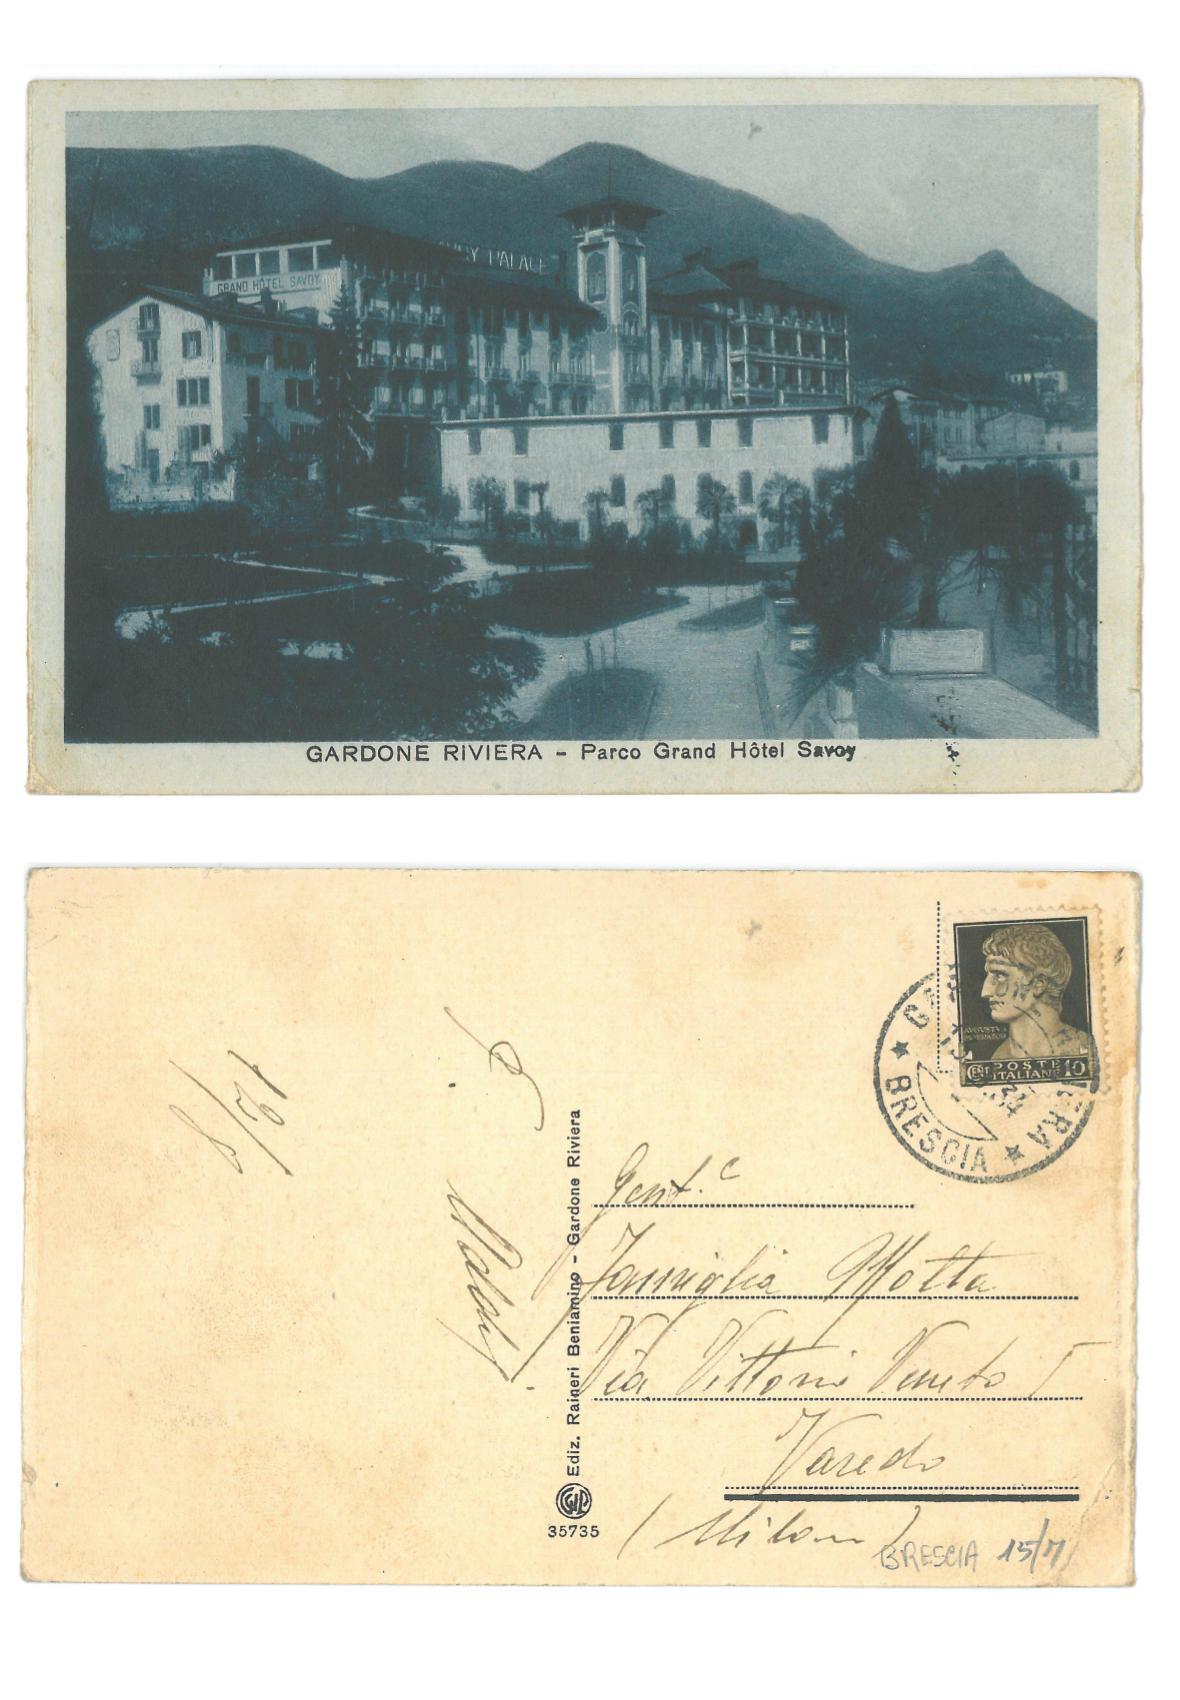 Gardone Riviera - Parco Grand Hotel Savoy